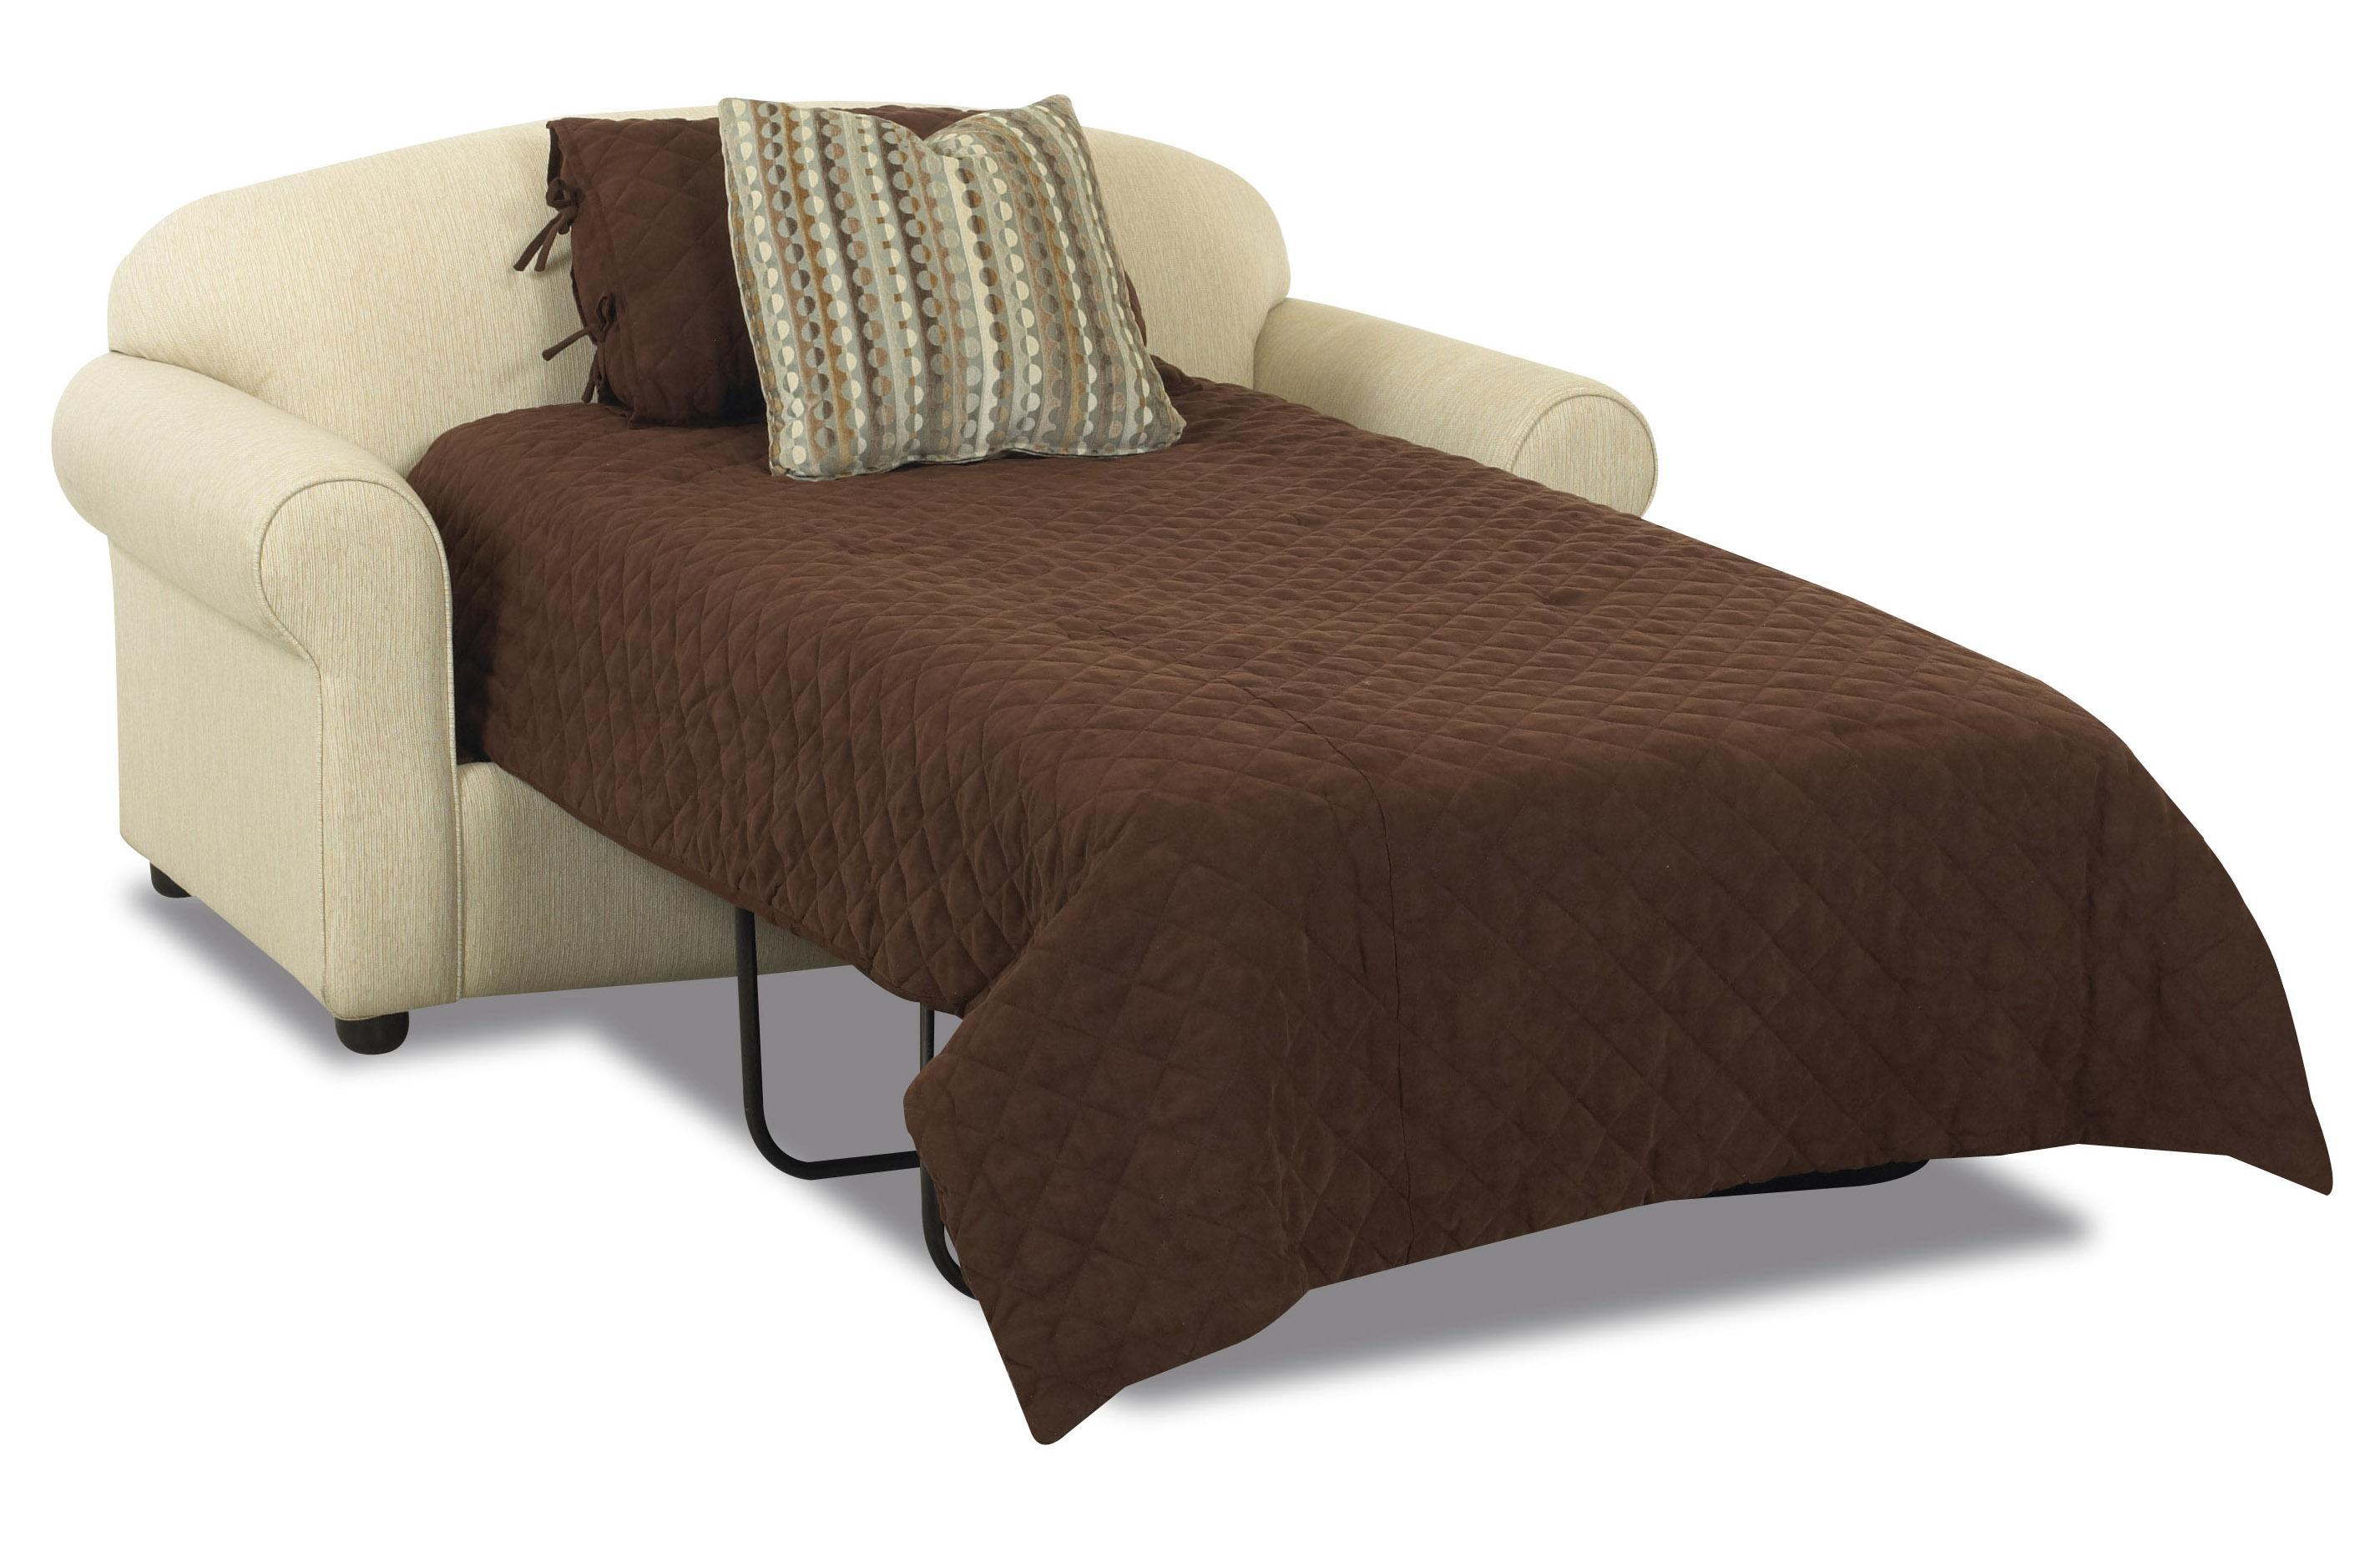 klaussner possibilities innerspring twin sleeper loveseat value city furniture sleeper sofas. Black Bedroom Furniture Sets. Home Design Ideas